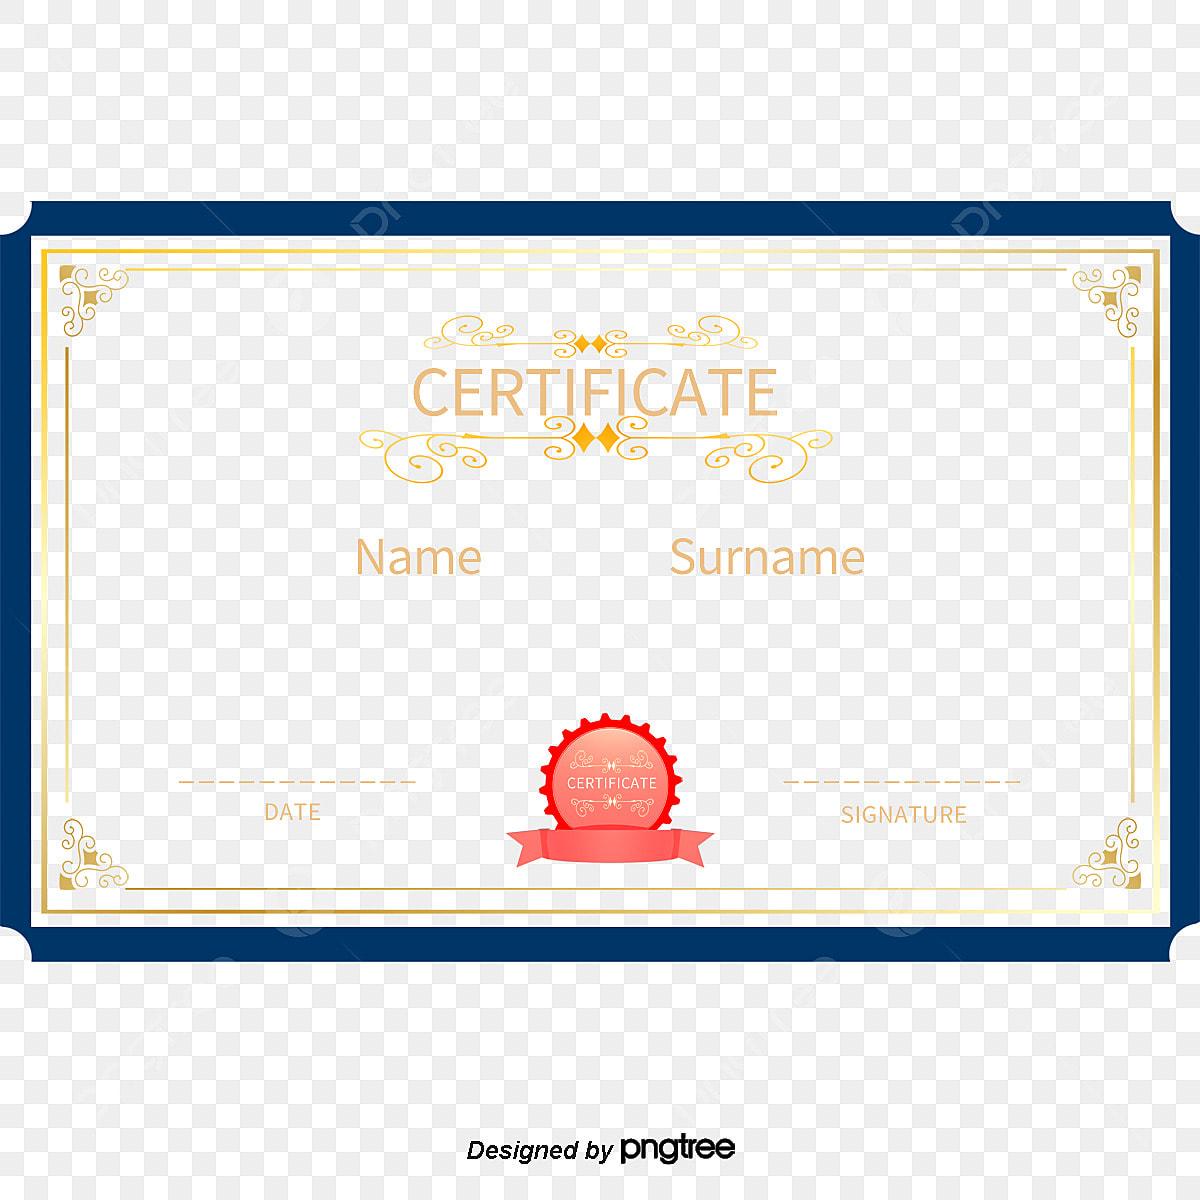 certificat de m u00e9dailles anglais m u00e9daille certificat de